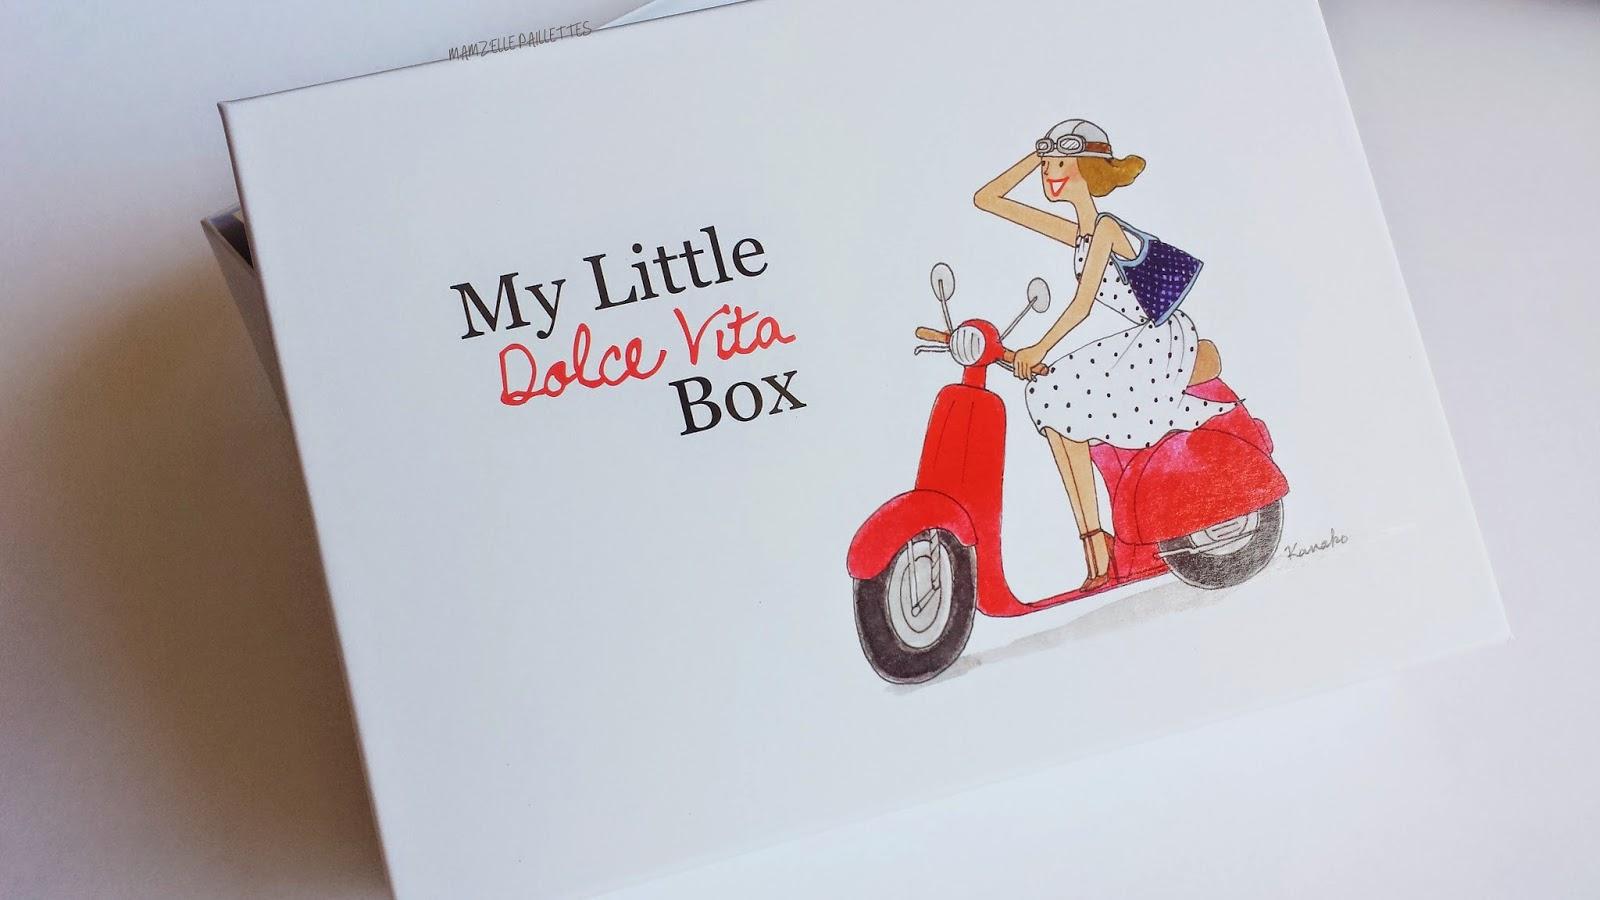 Little Box juin 2014